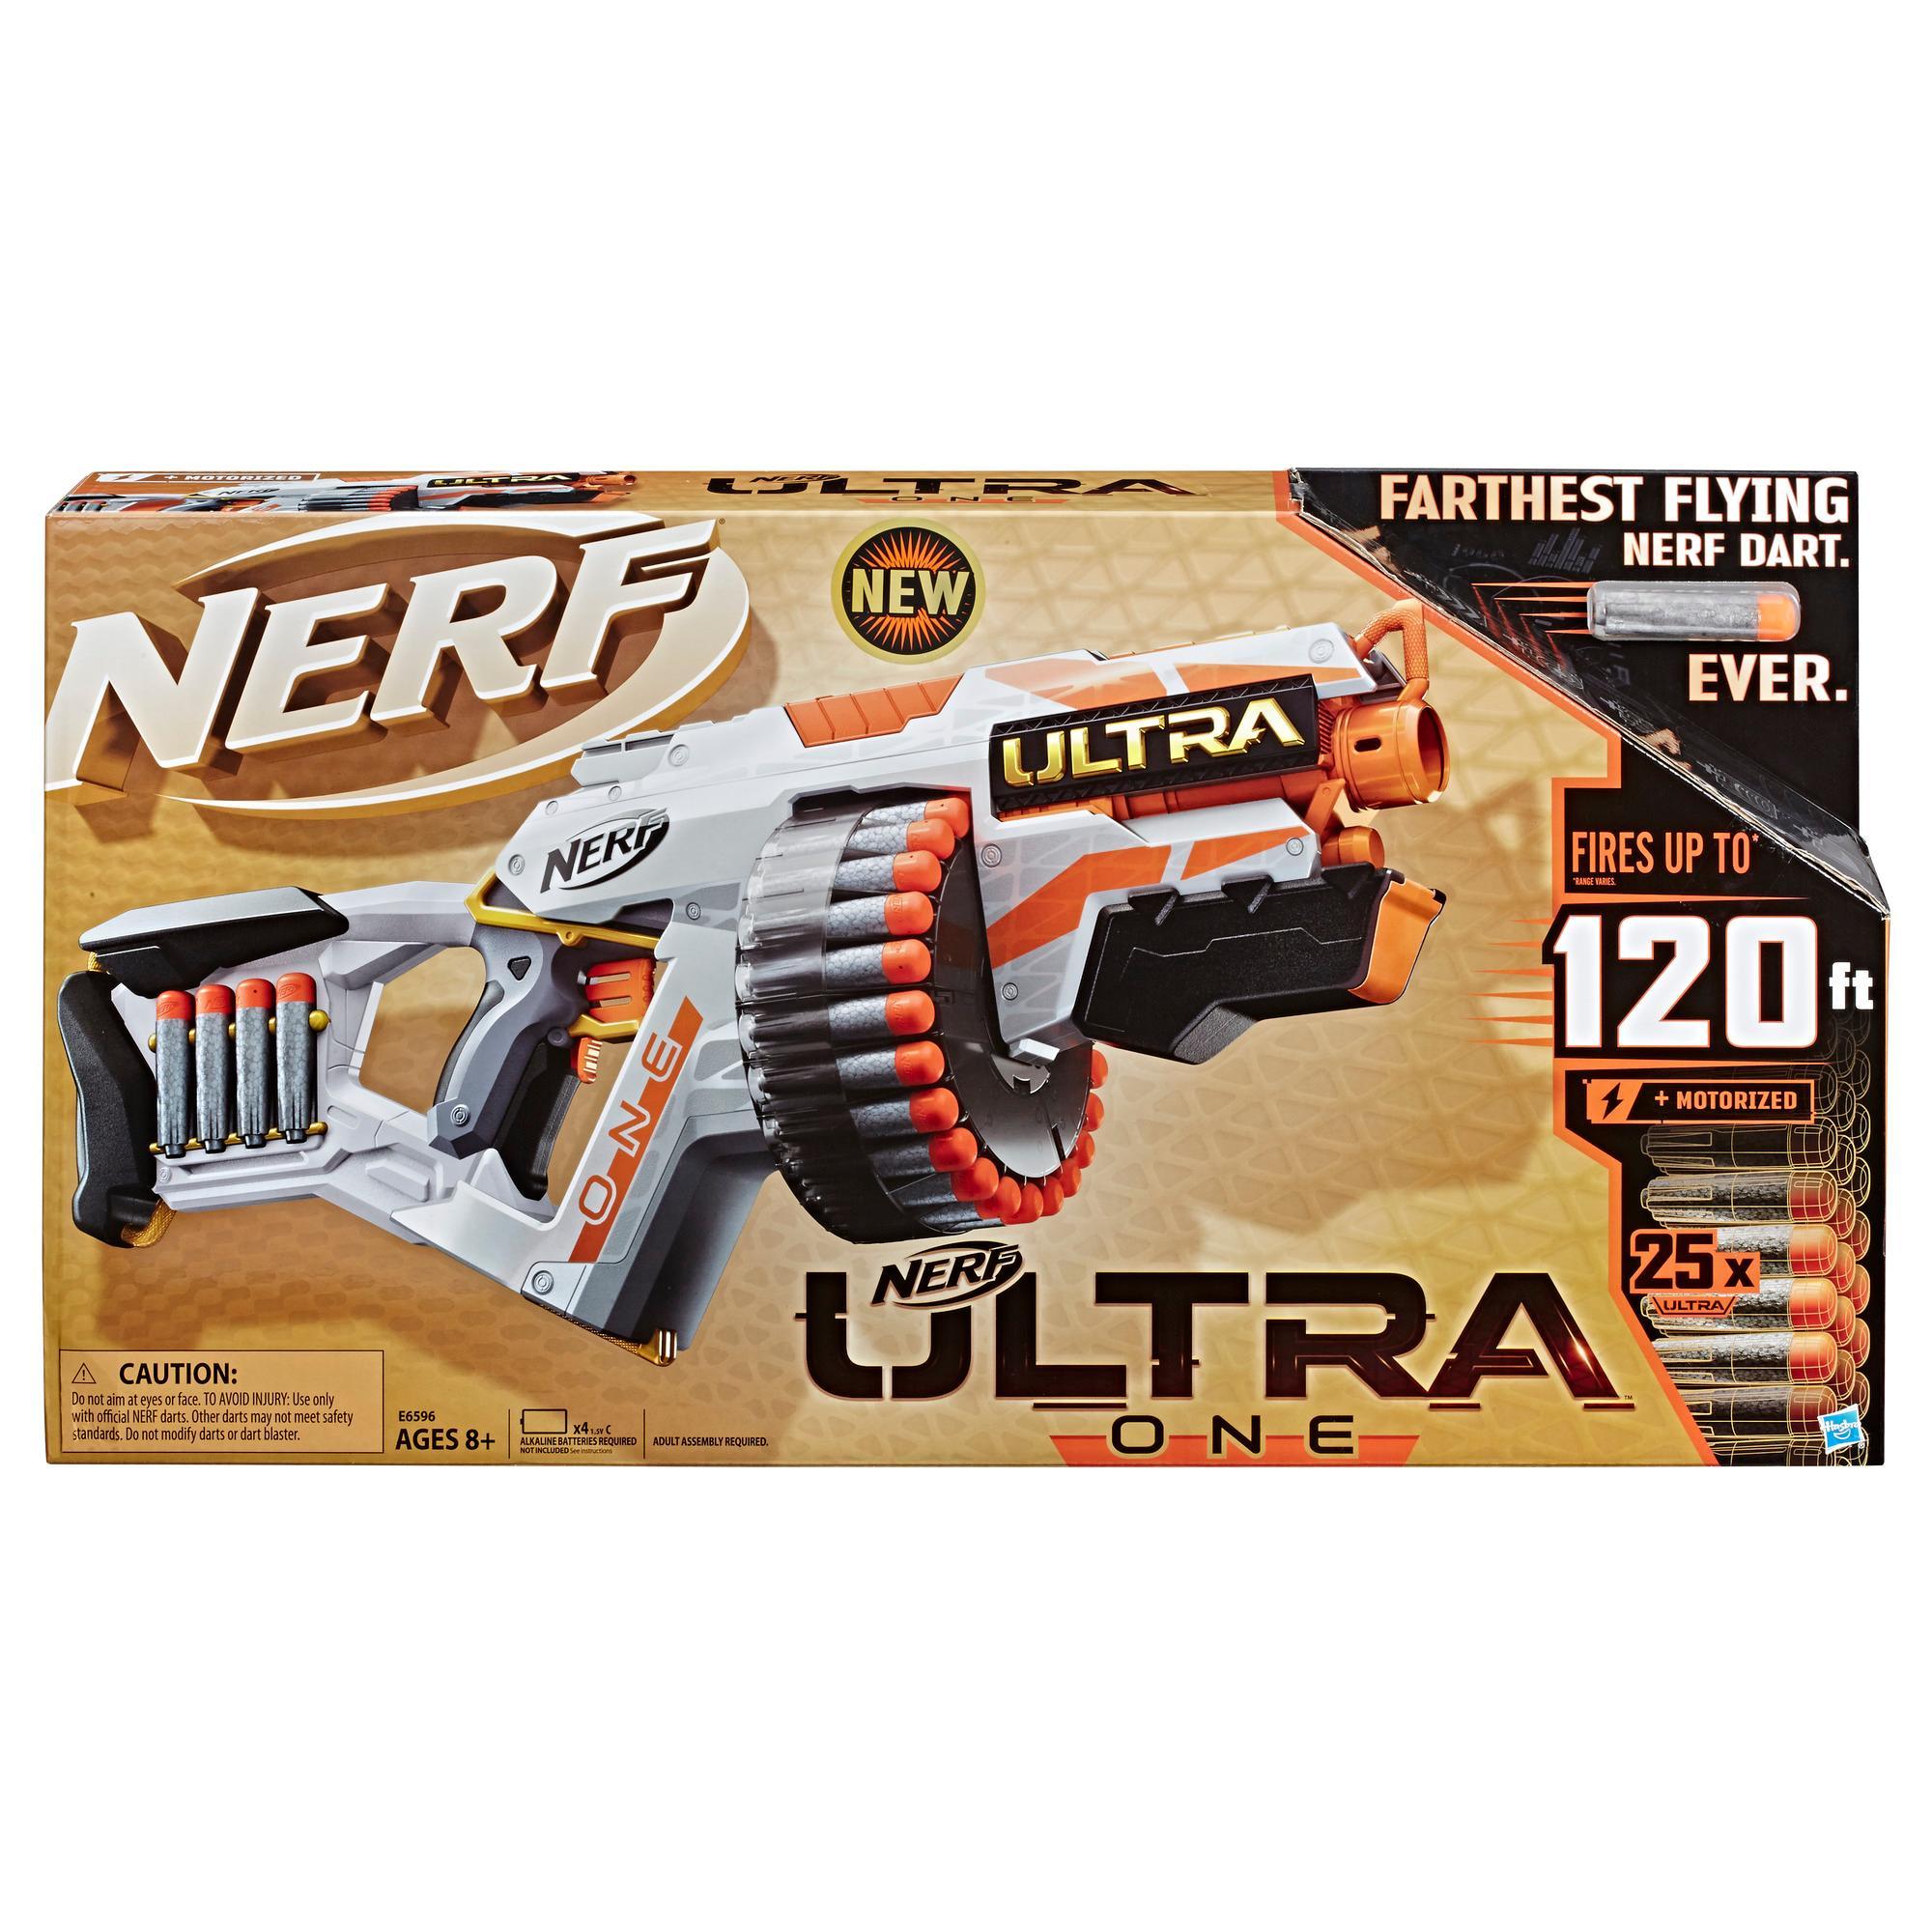 Lanzador motorizado Nerf Ultra One -- 25 dardos Nerf Ultra - Solo compatible con dardos Nerf Ultra